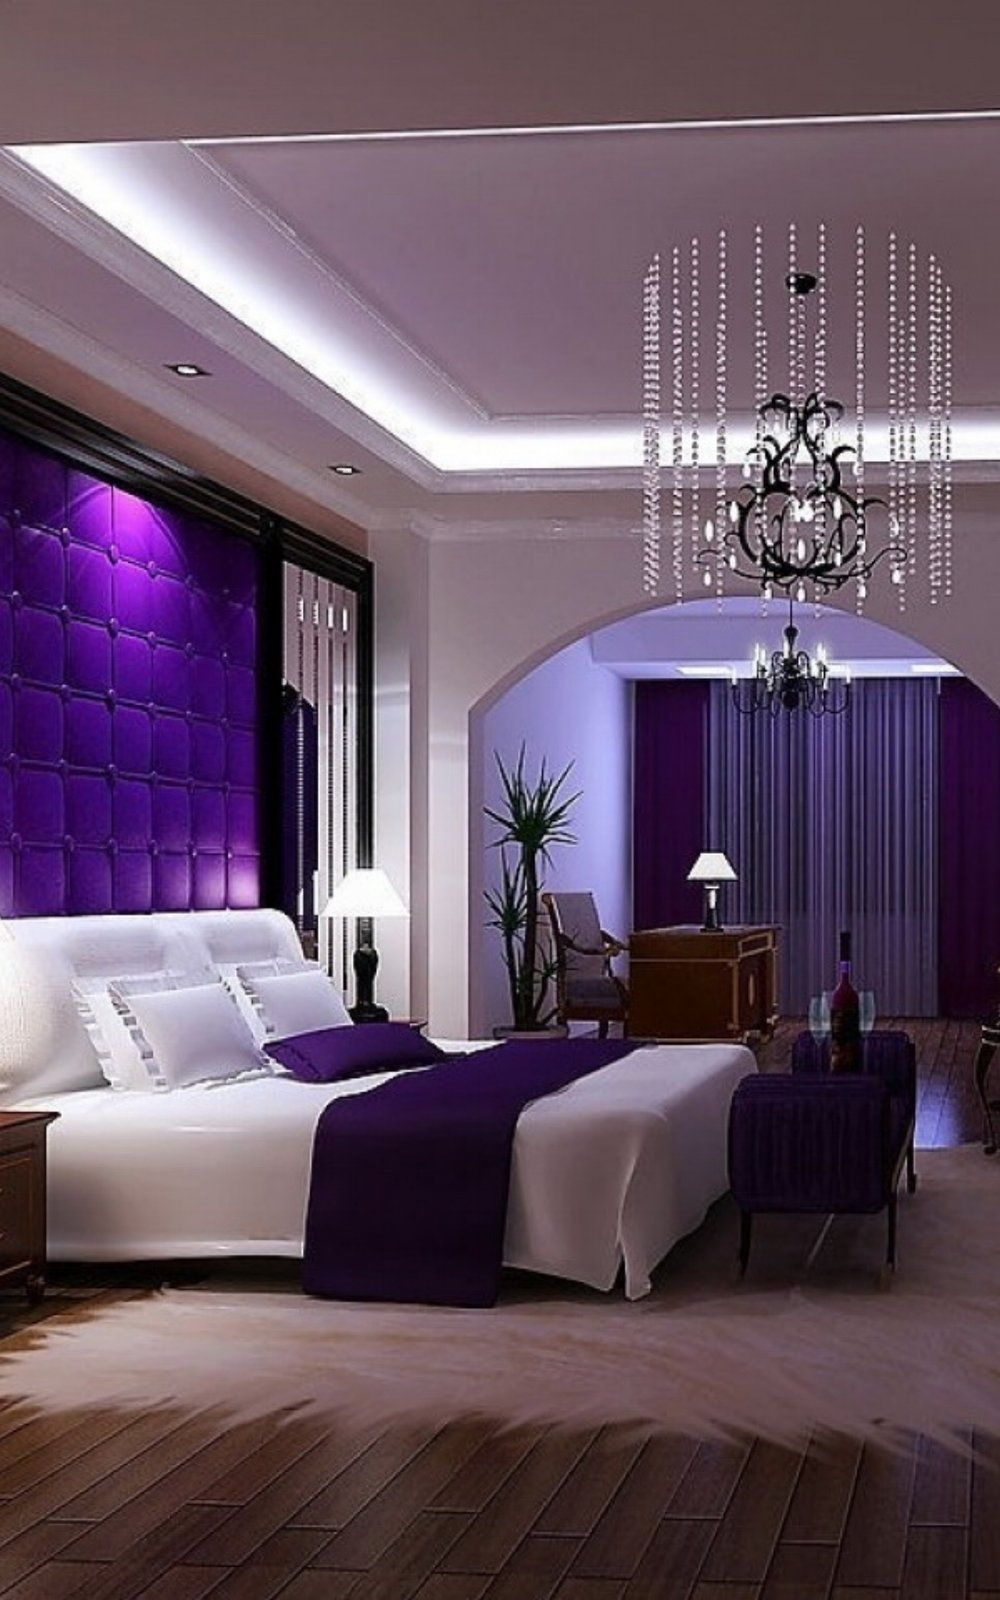 Master bedroom bedroom ceiling decor   Gorgeous Master Bedroom Designs  Interior  Pinterest  Bedroom